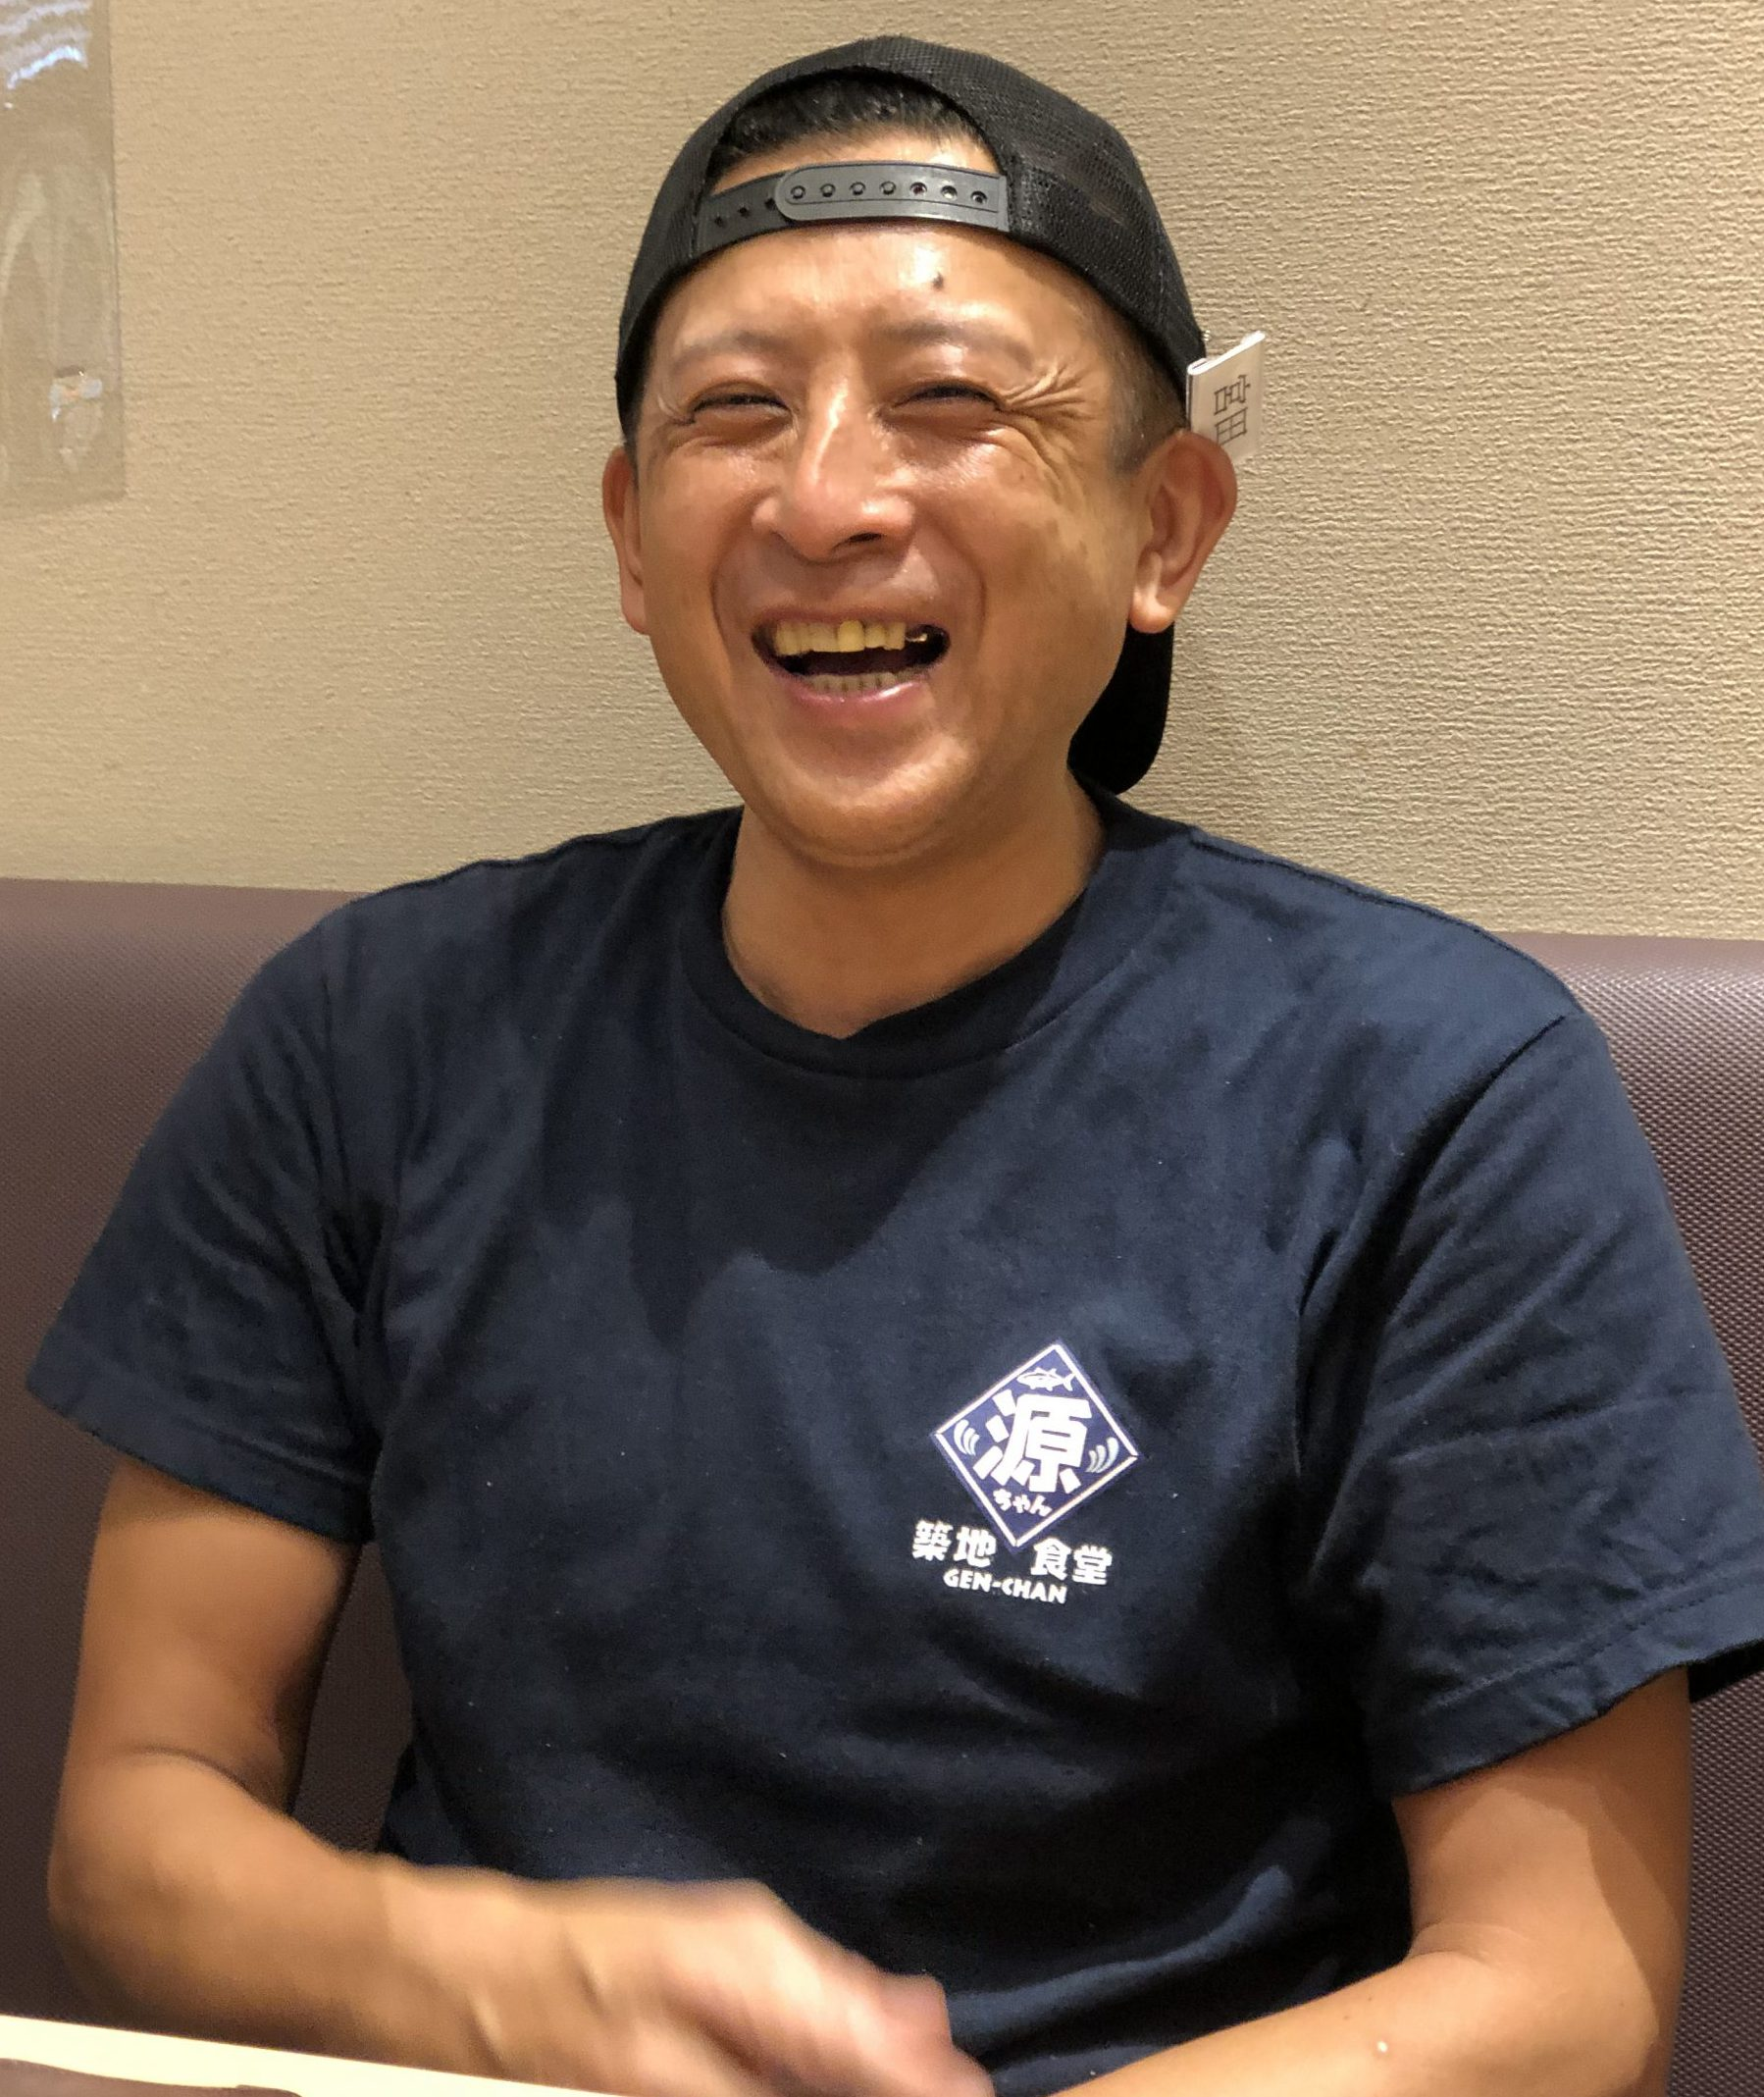 宮田 裕史